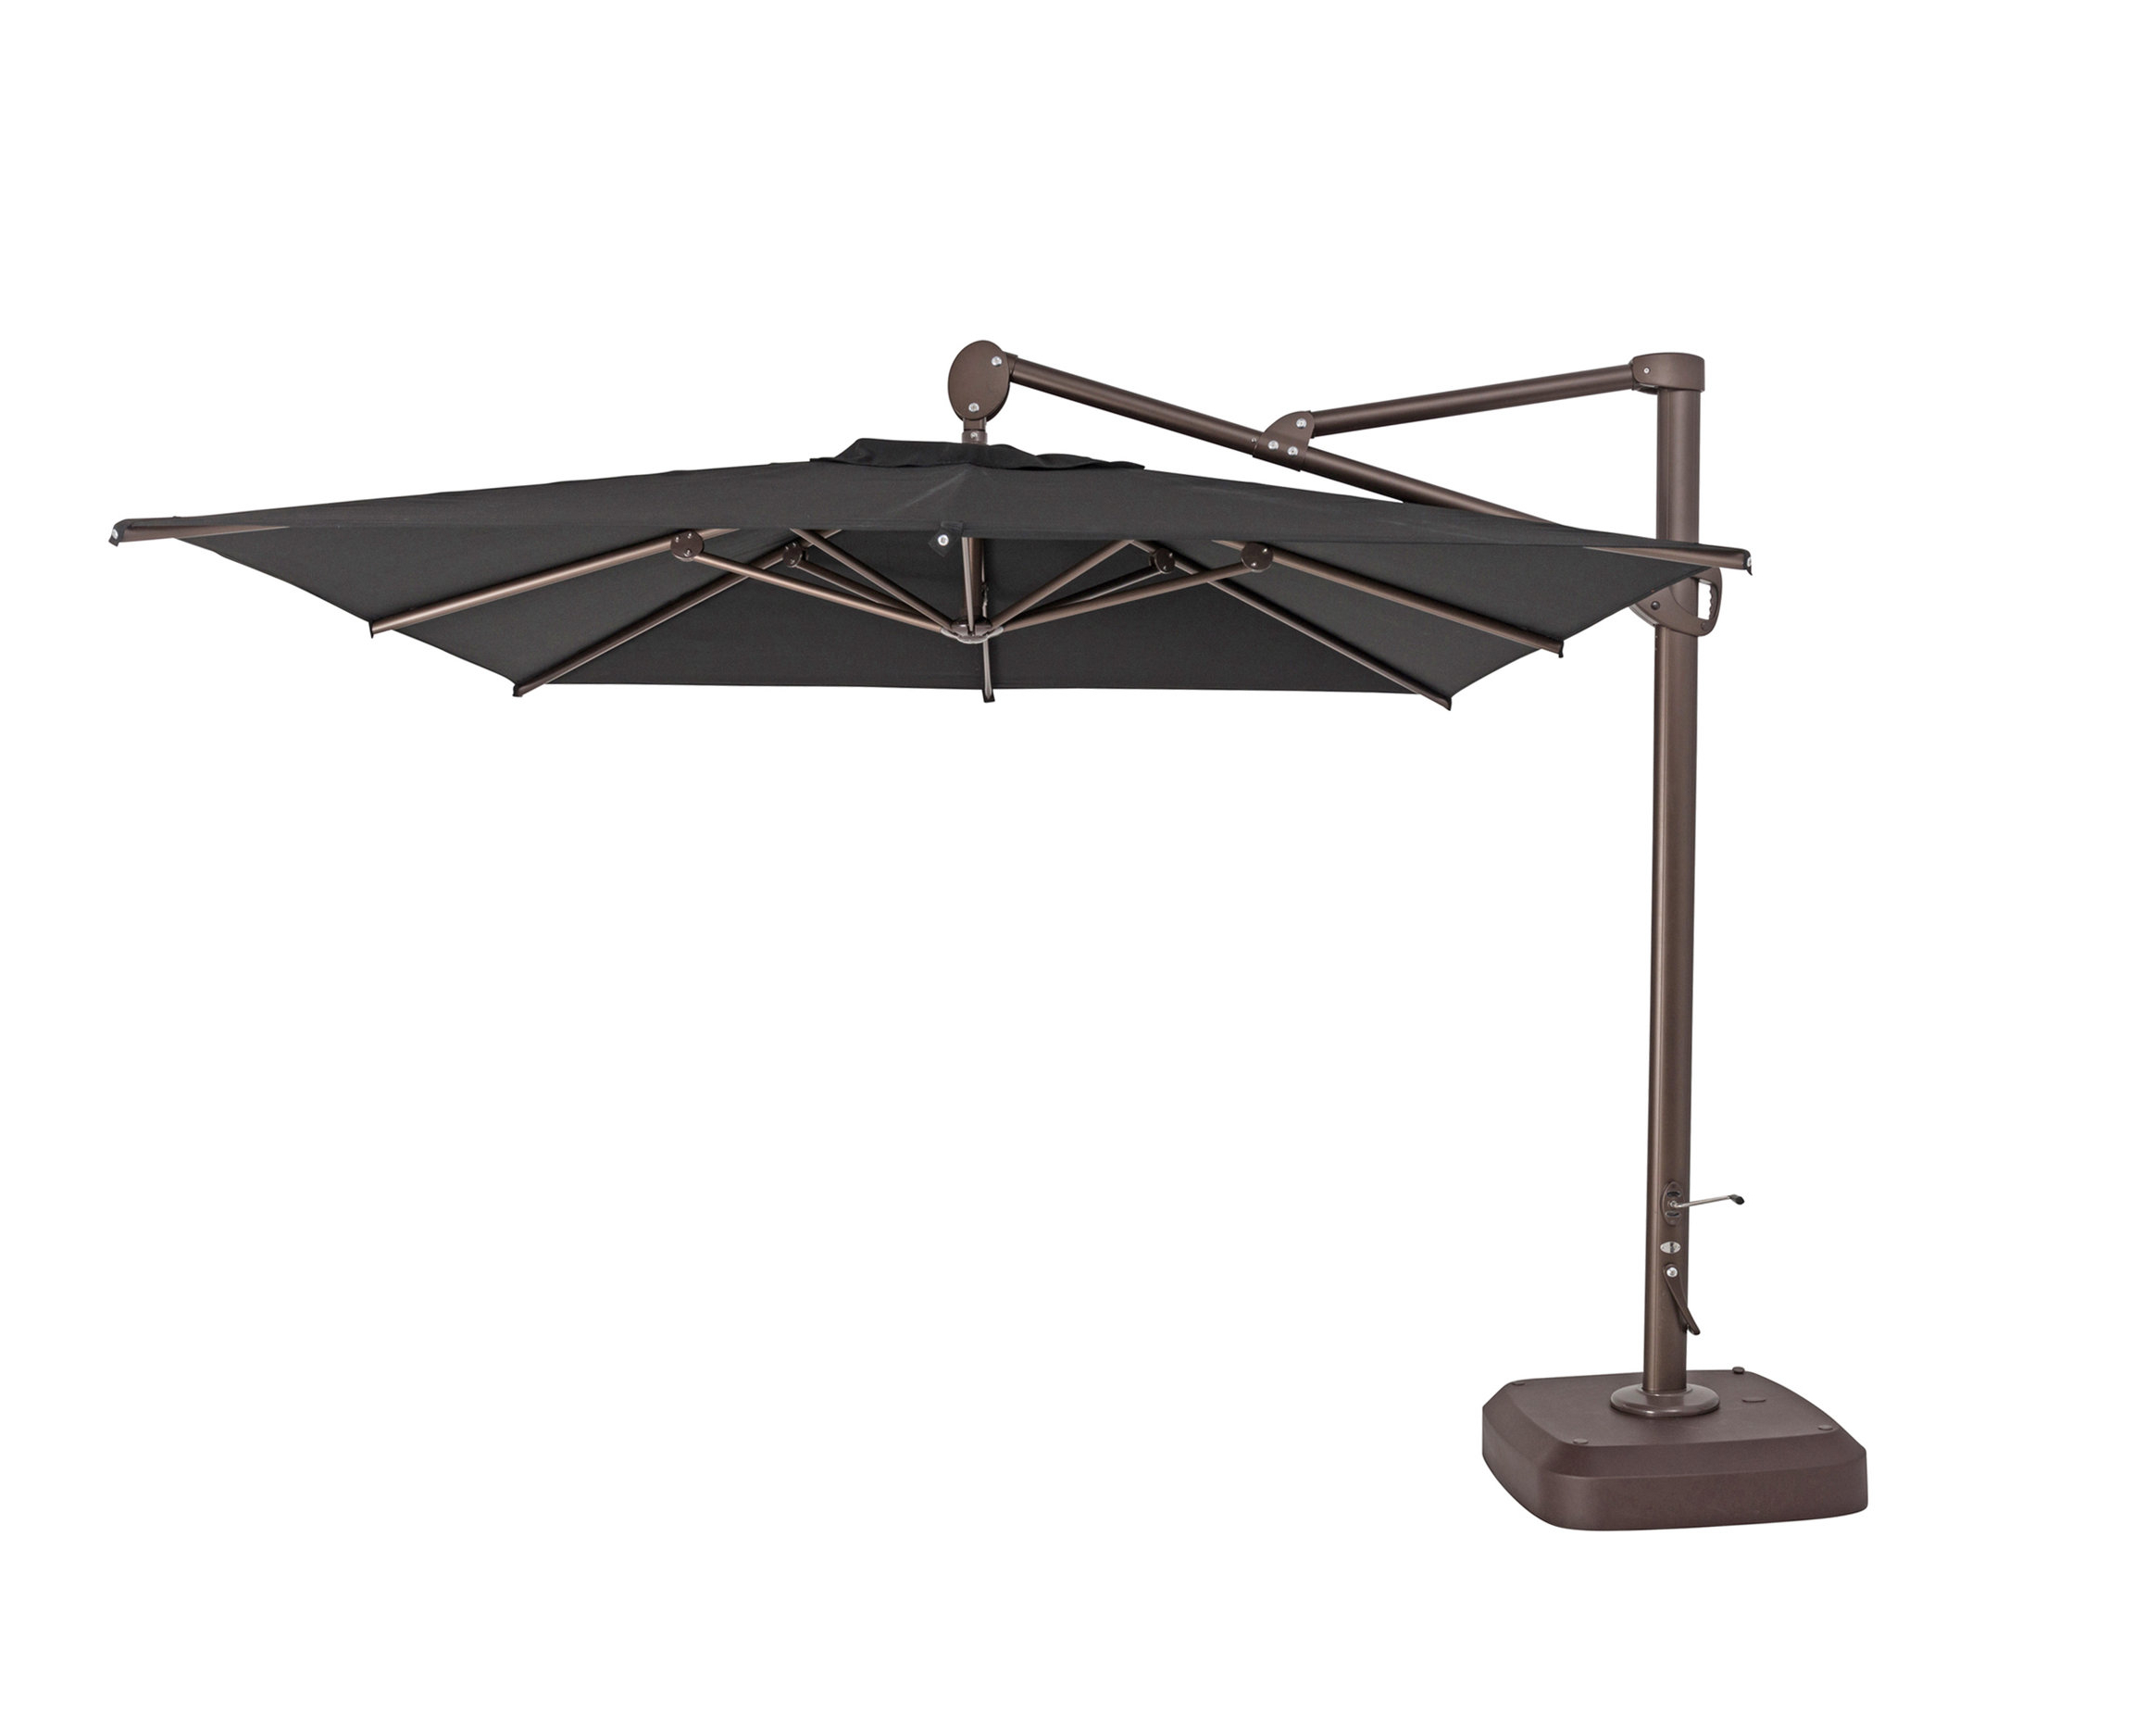 Spitler Square Cantilever Umbrellas For Fashionable 10' Square Cantilever Umbrella (View 9 of 20)